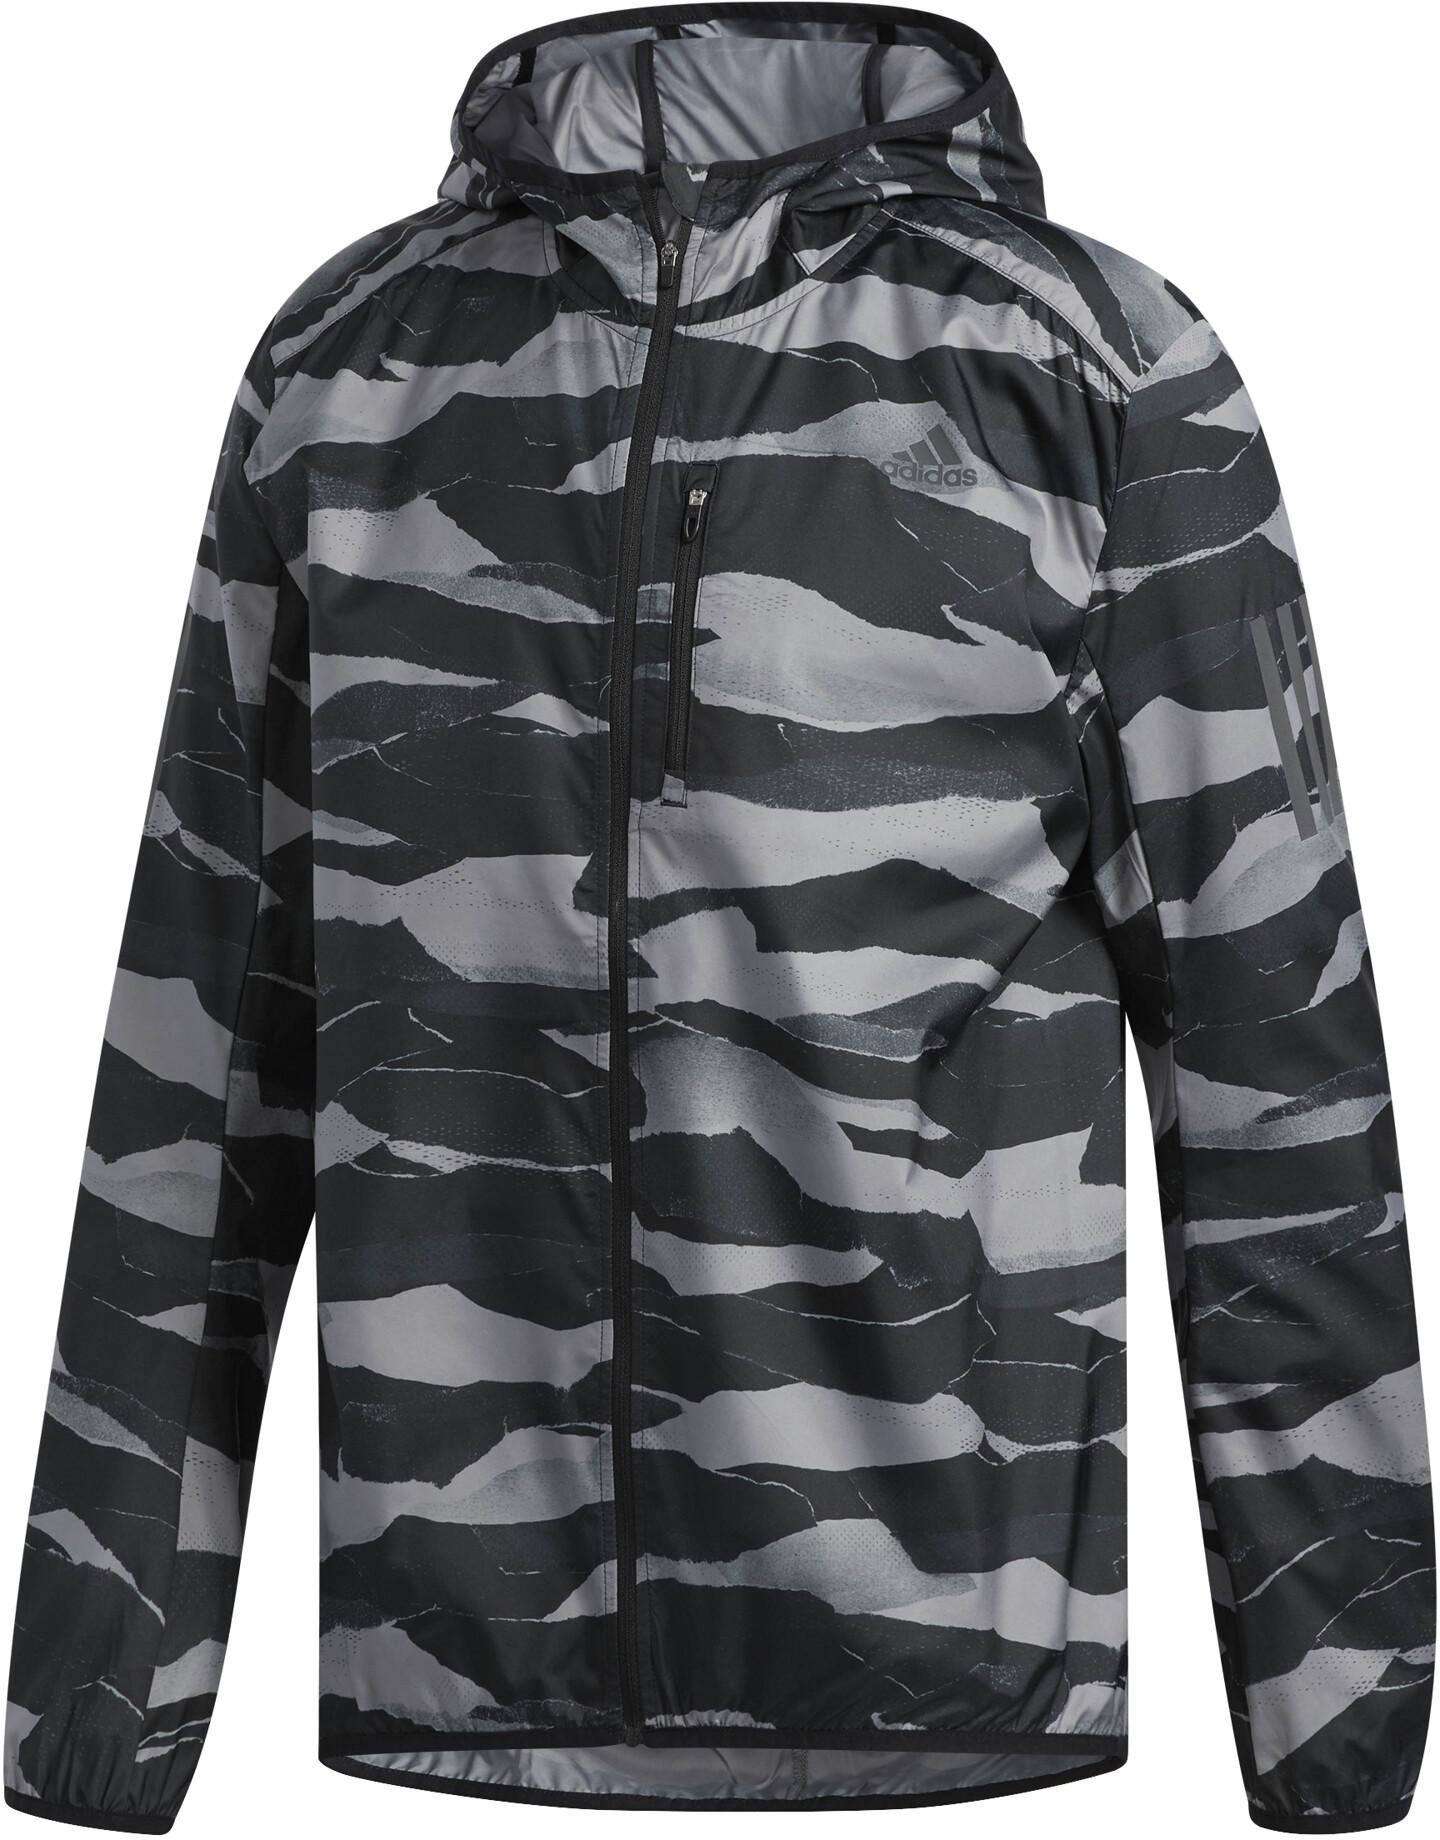 57bd7428b259 adidas Own The Run Running Jacket Men grey black at Bikester.co.uk